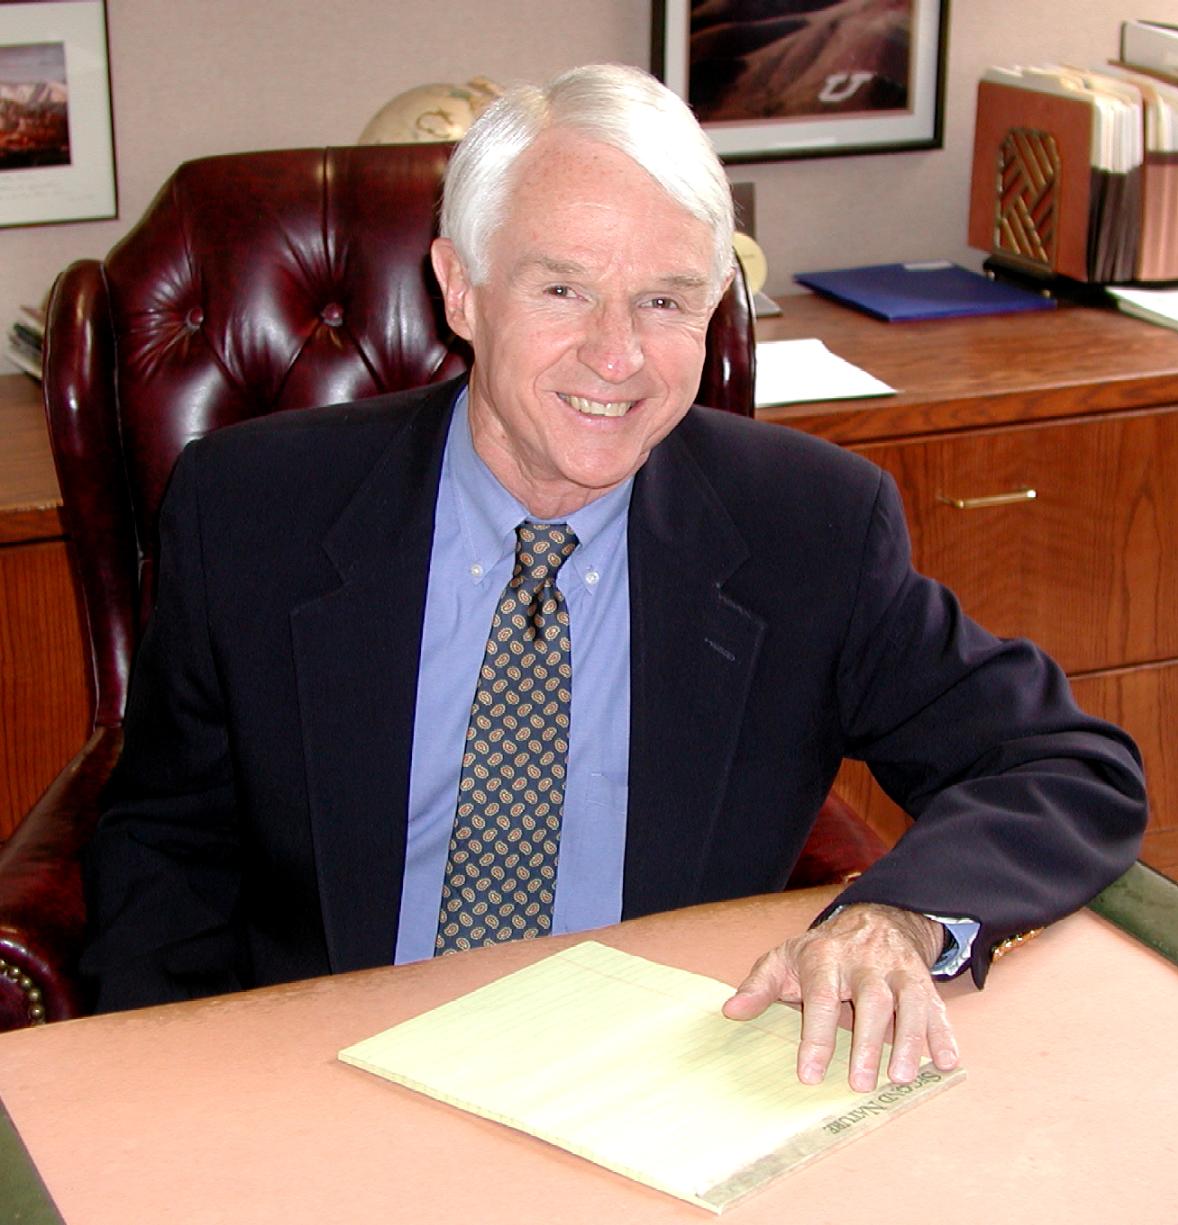 John Ashton, executive director of the University of Utah Alumni Association